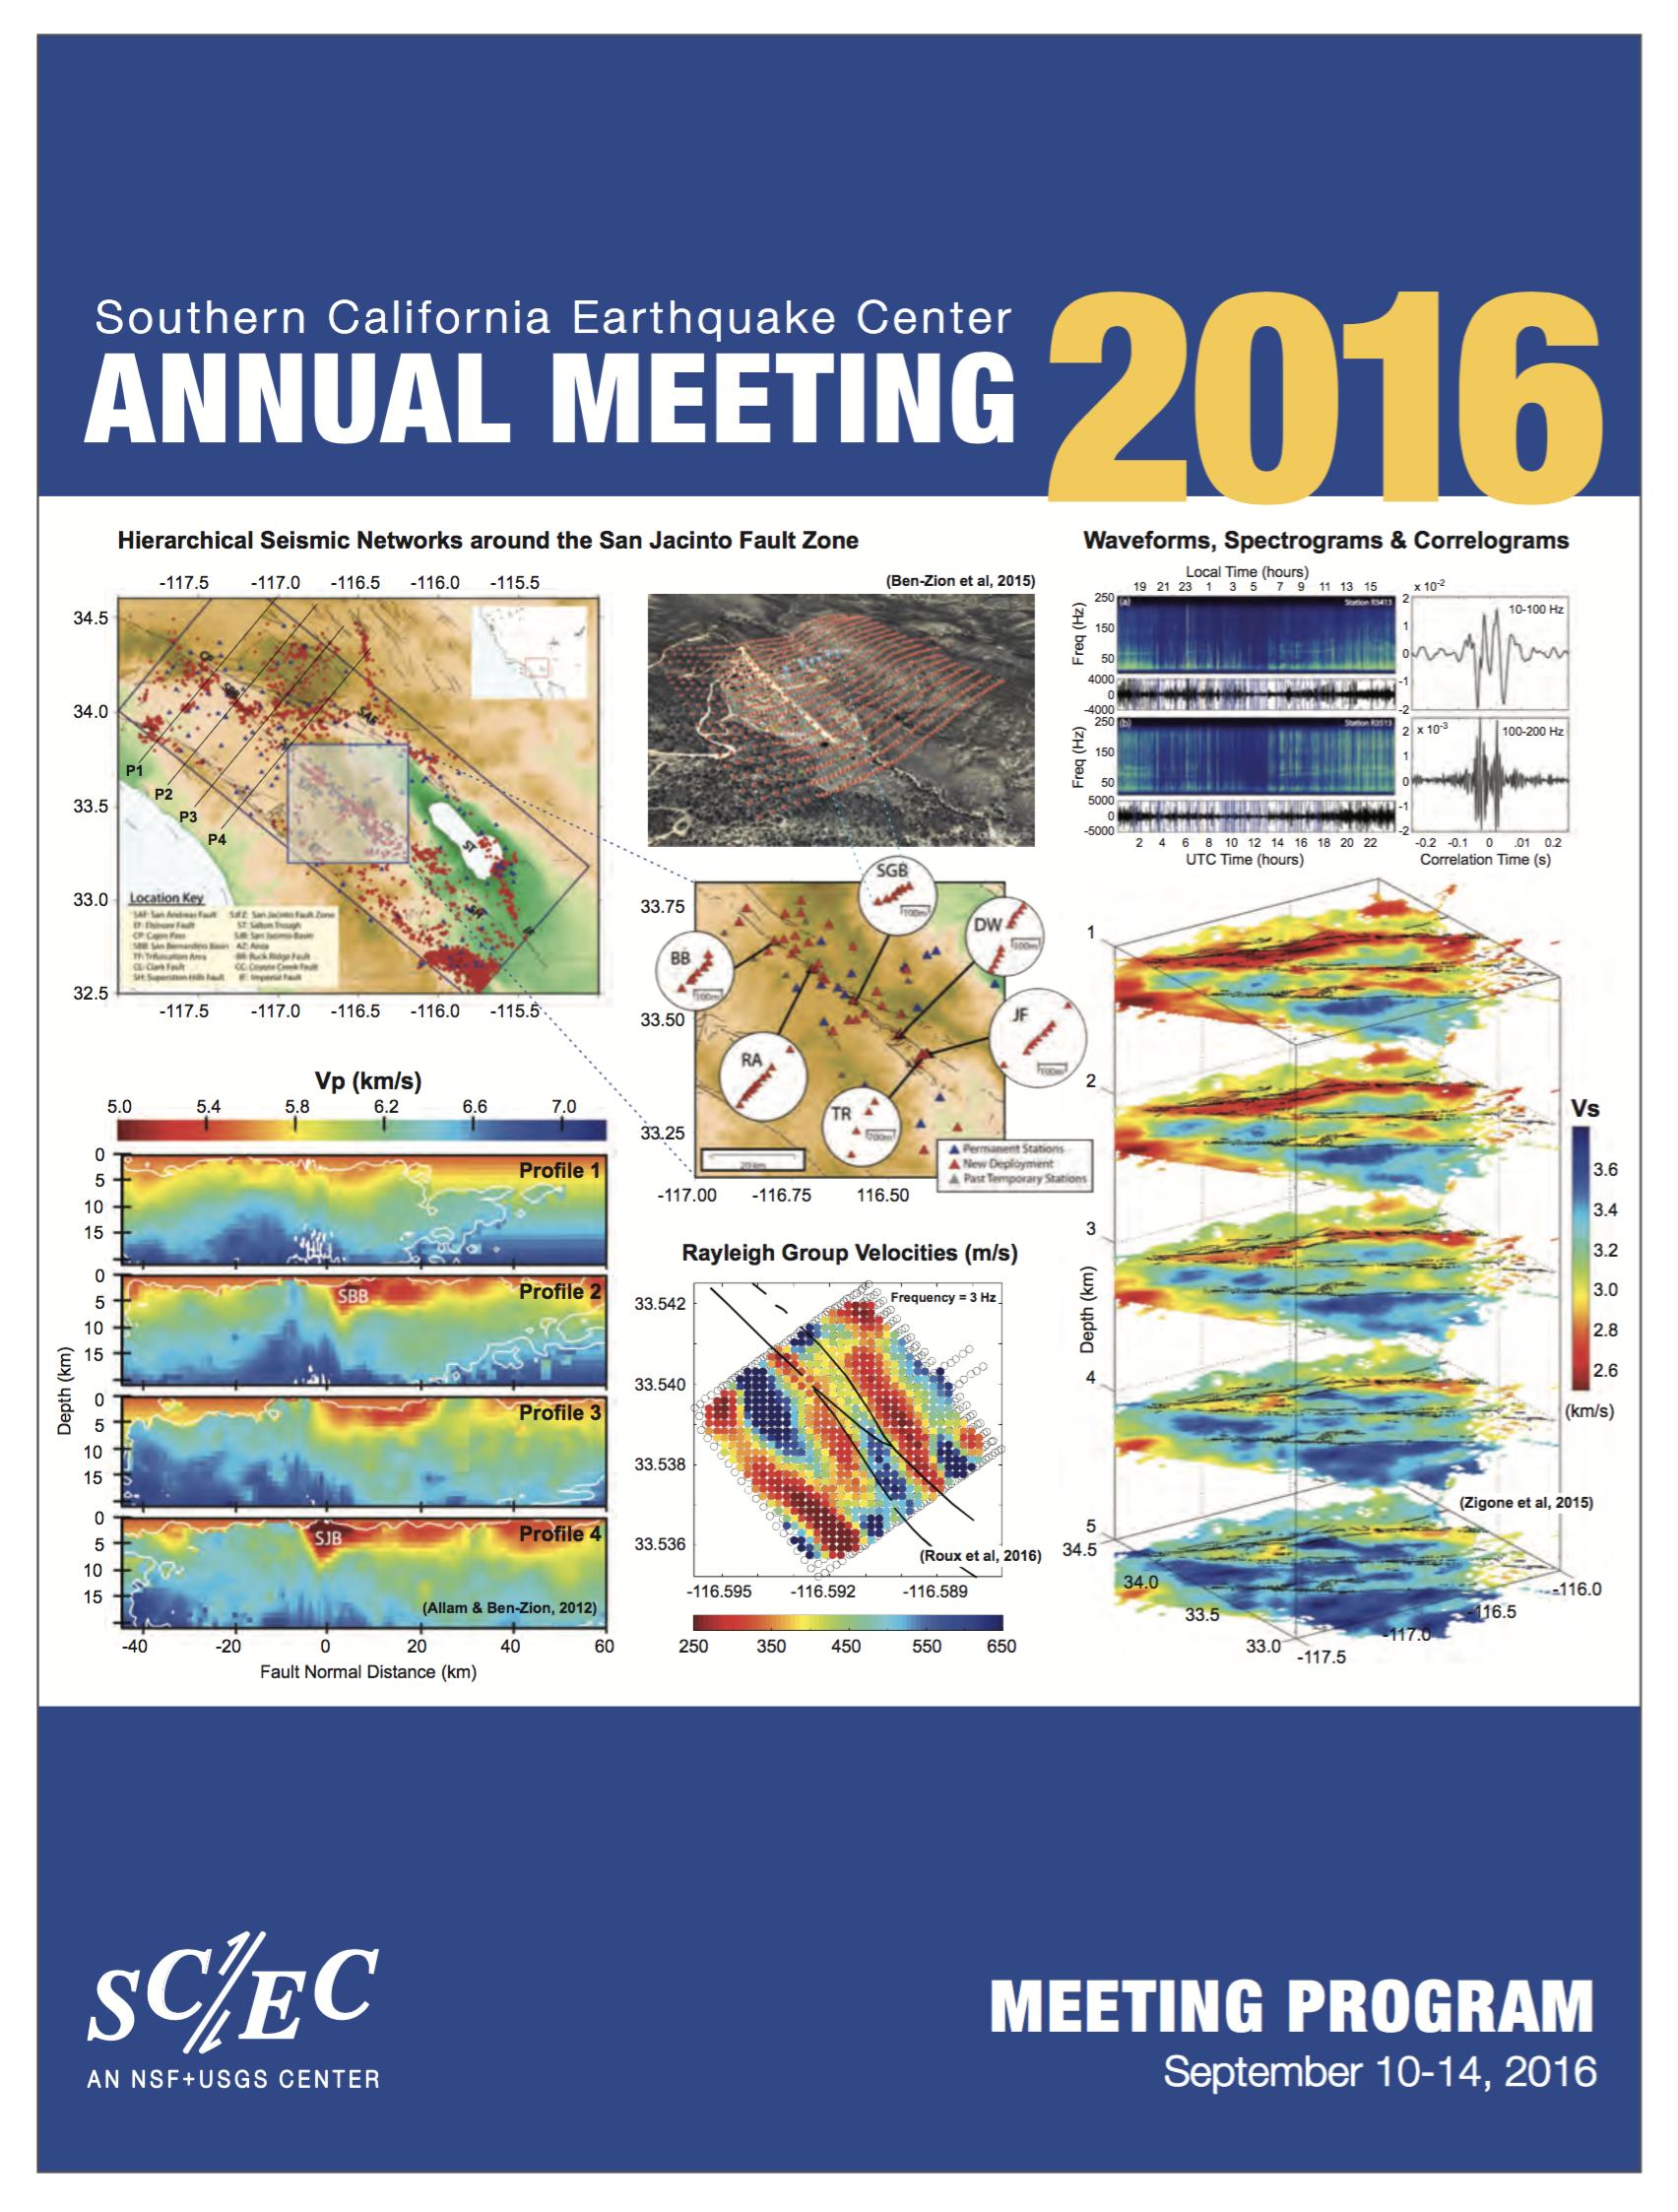 2015 SCEC Program